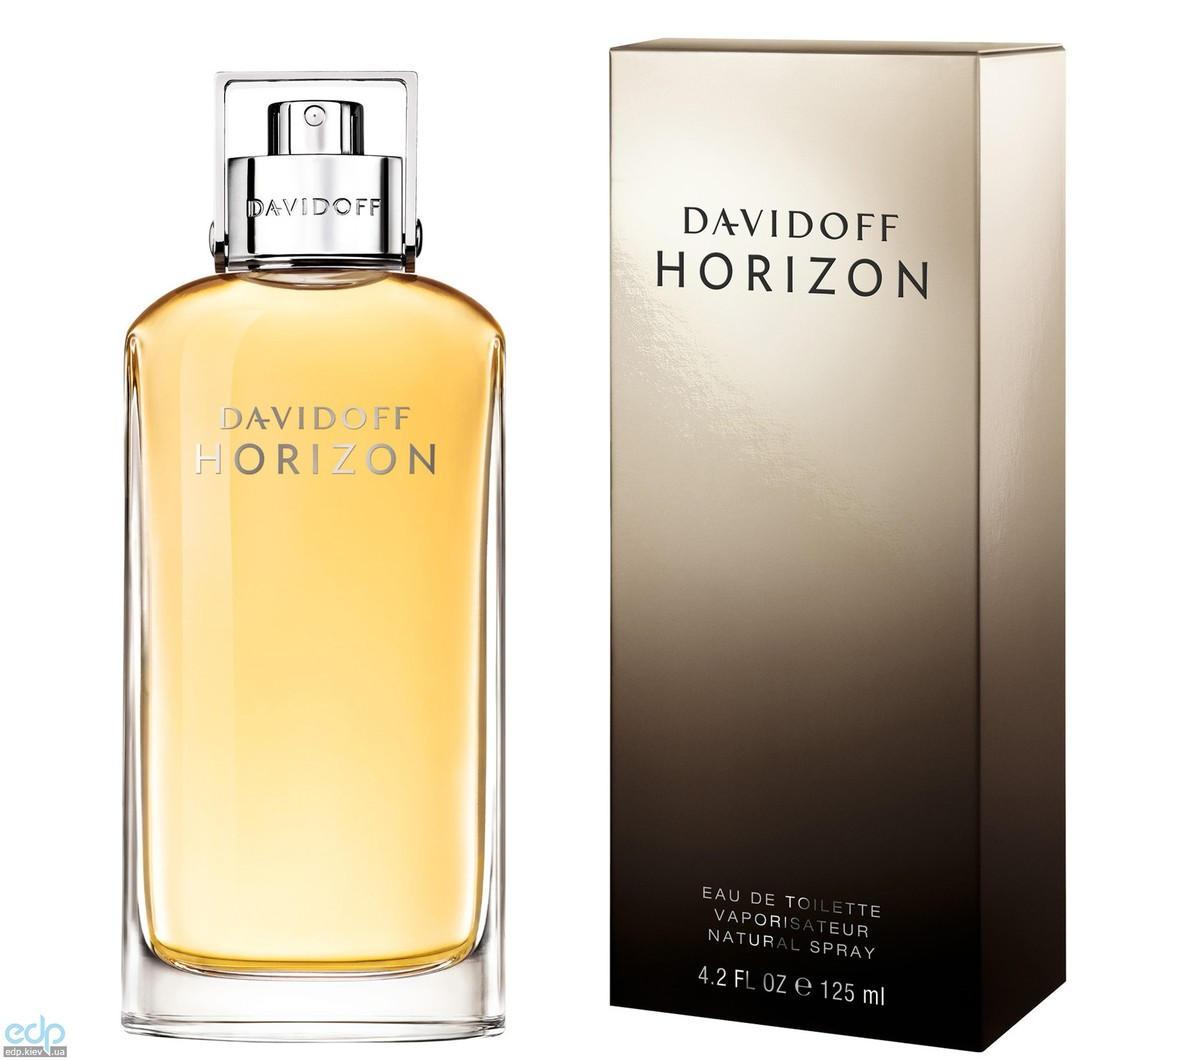 Davidoff Horizon